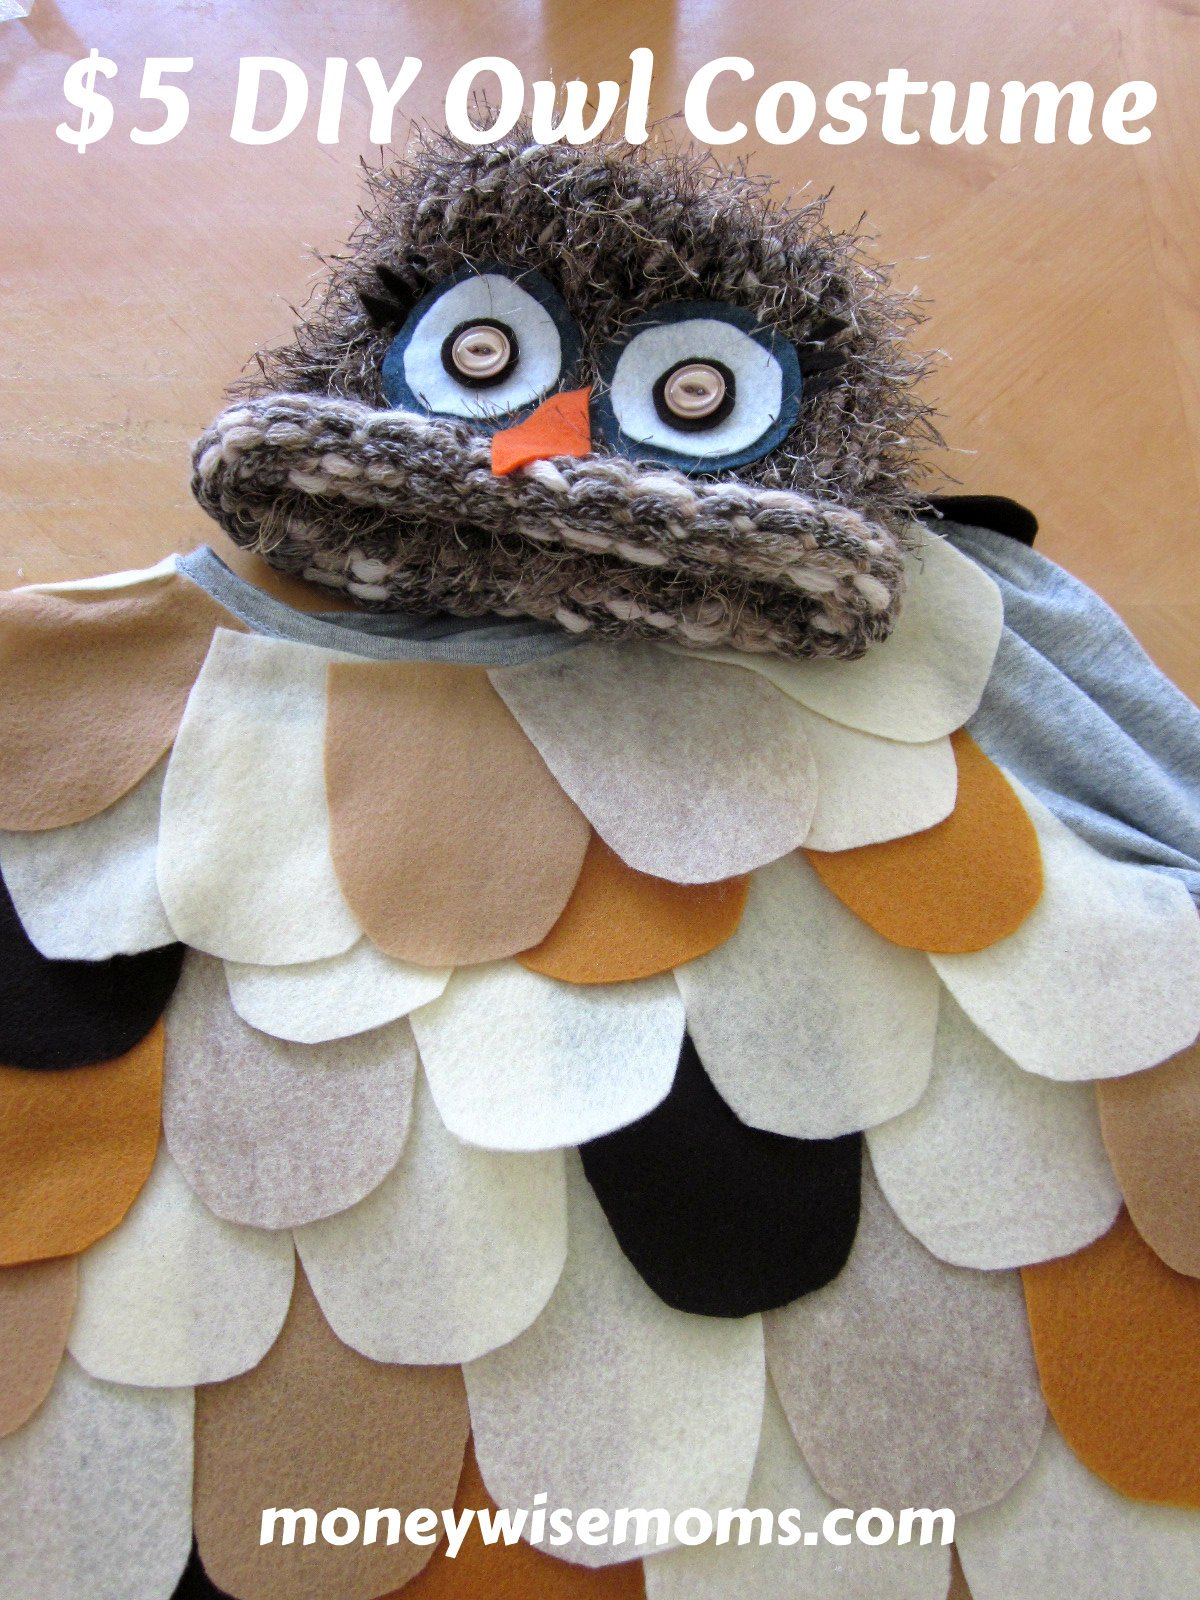 DIY Owl Costume | MoneywiseMoms